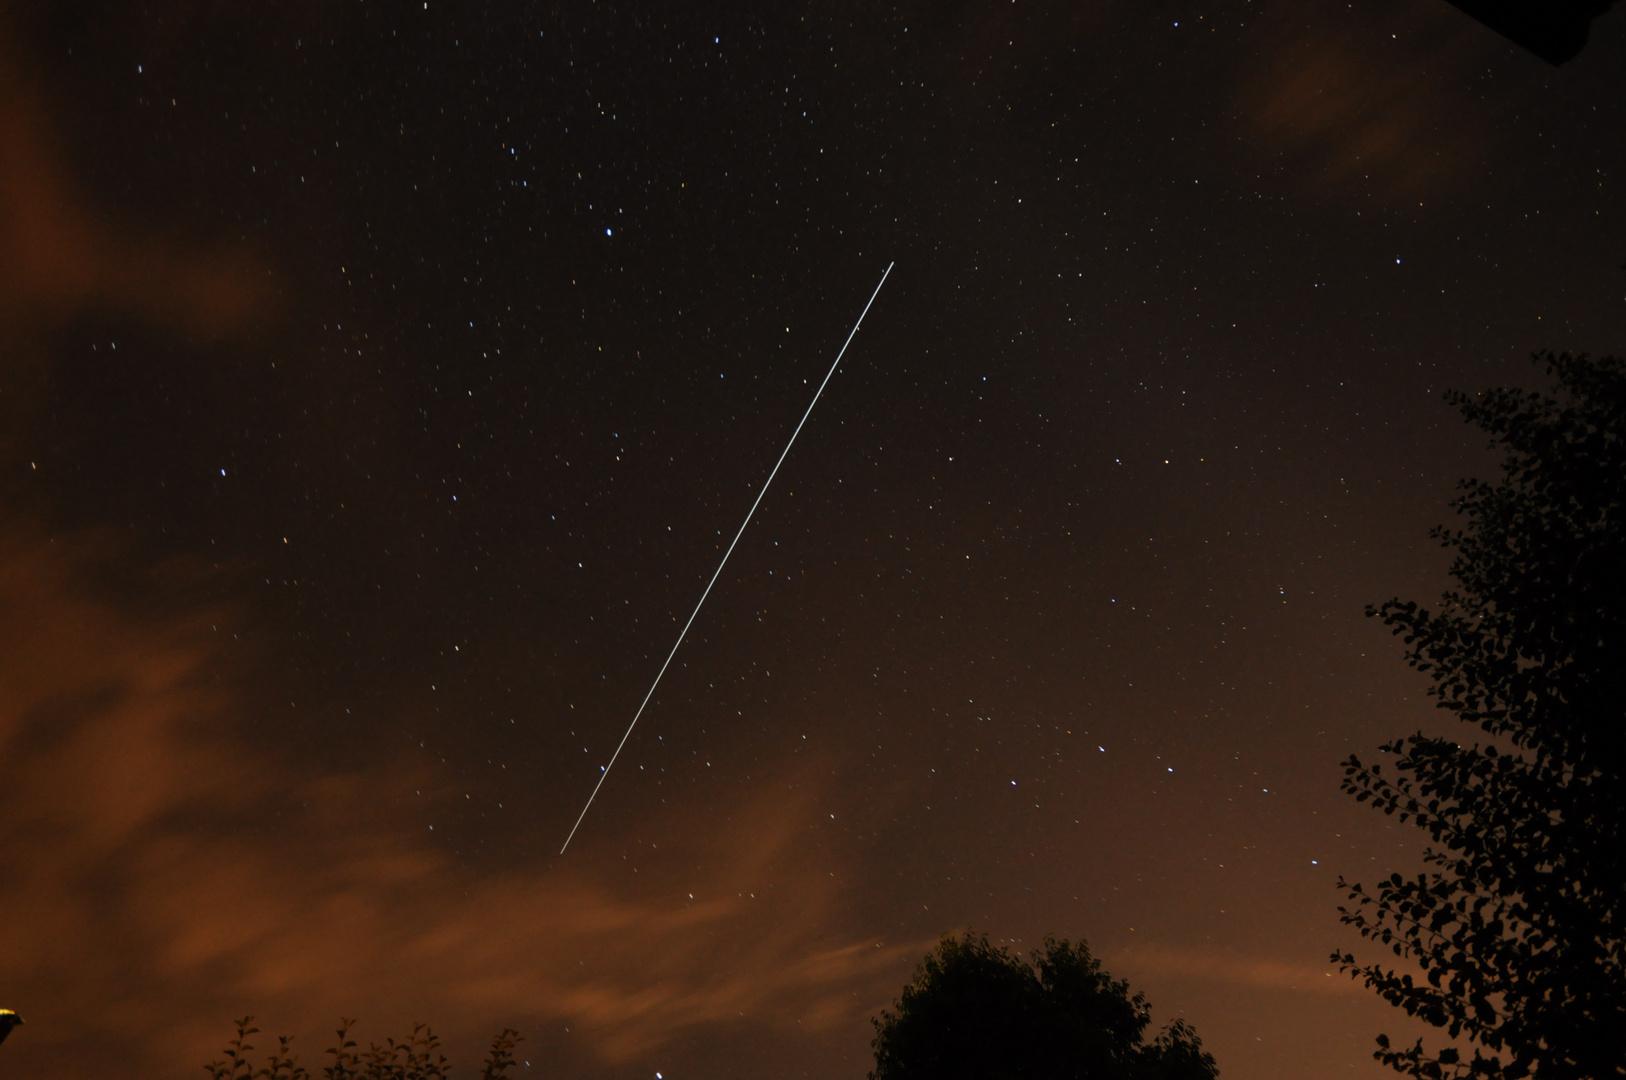 ISS Überflug am 23.05.2013 um 23:15 Uhr